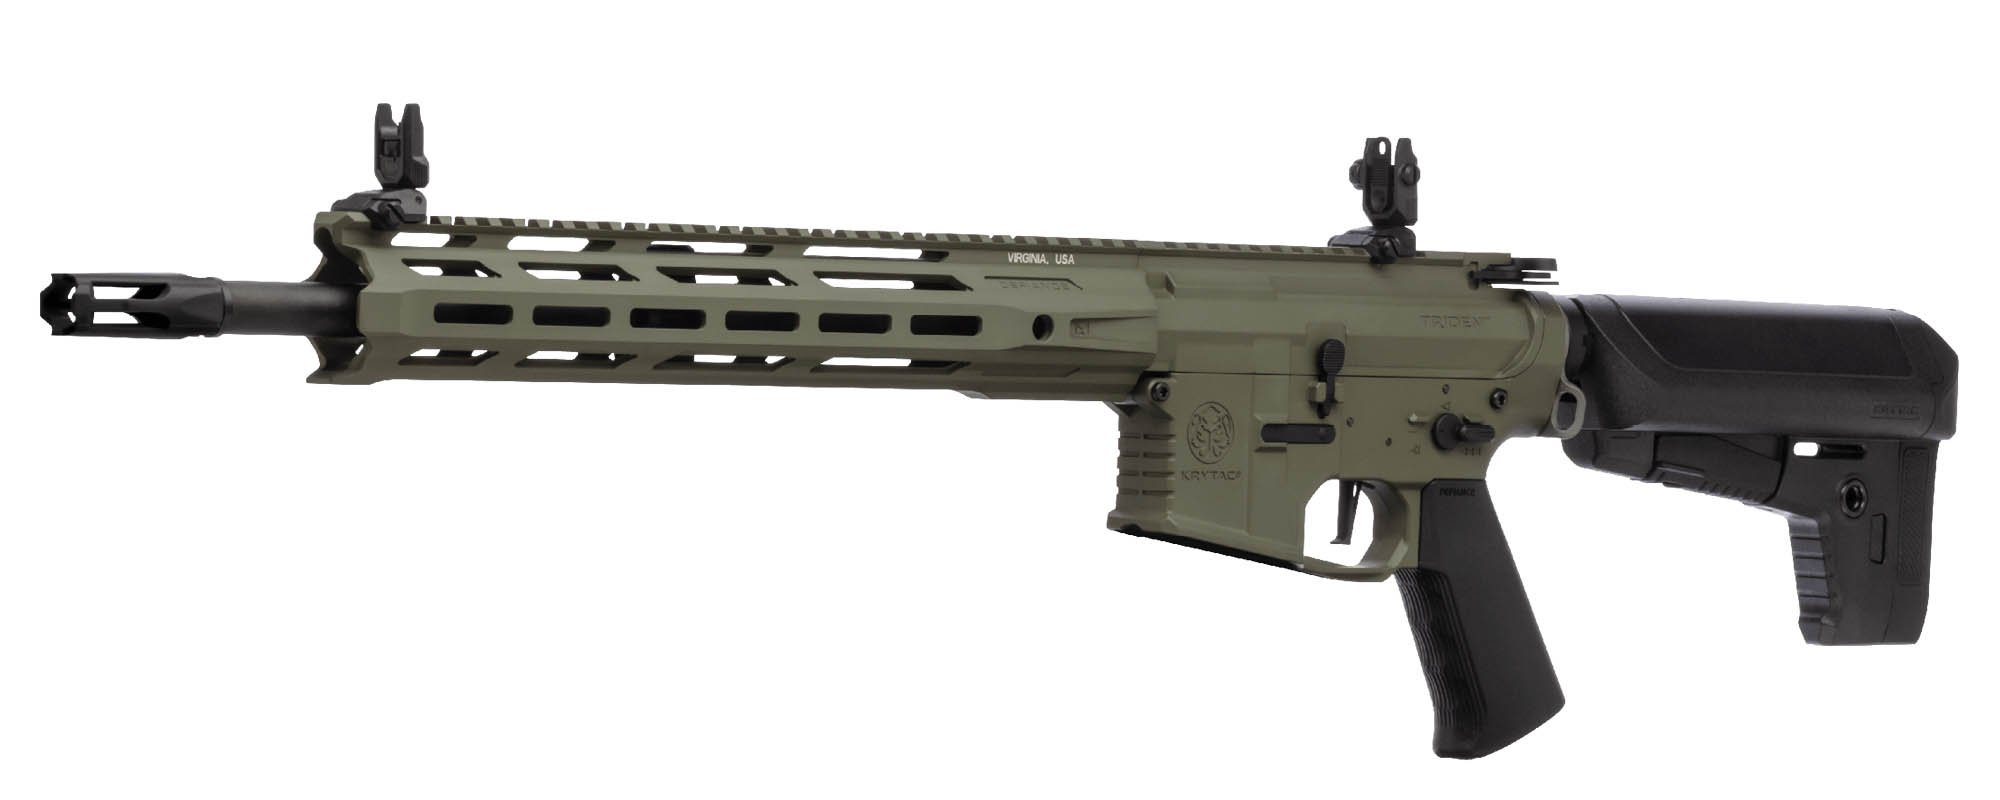 Krytac Trident Mk2 SPR-M, Foliage Green